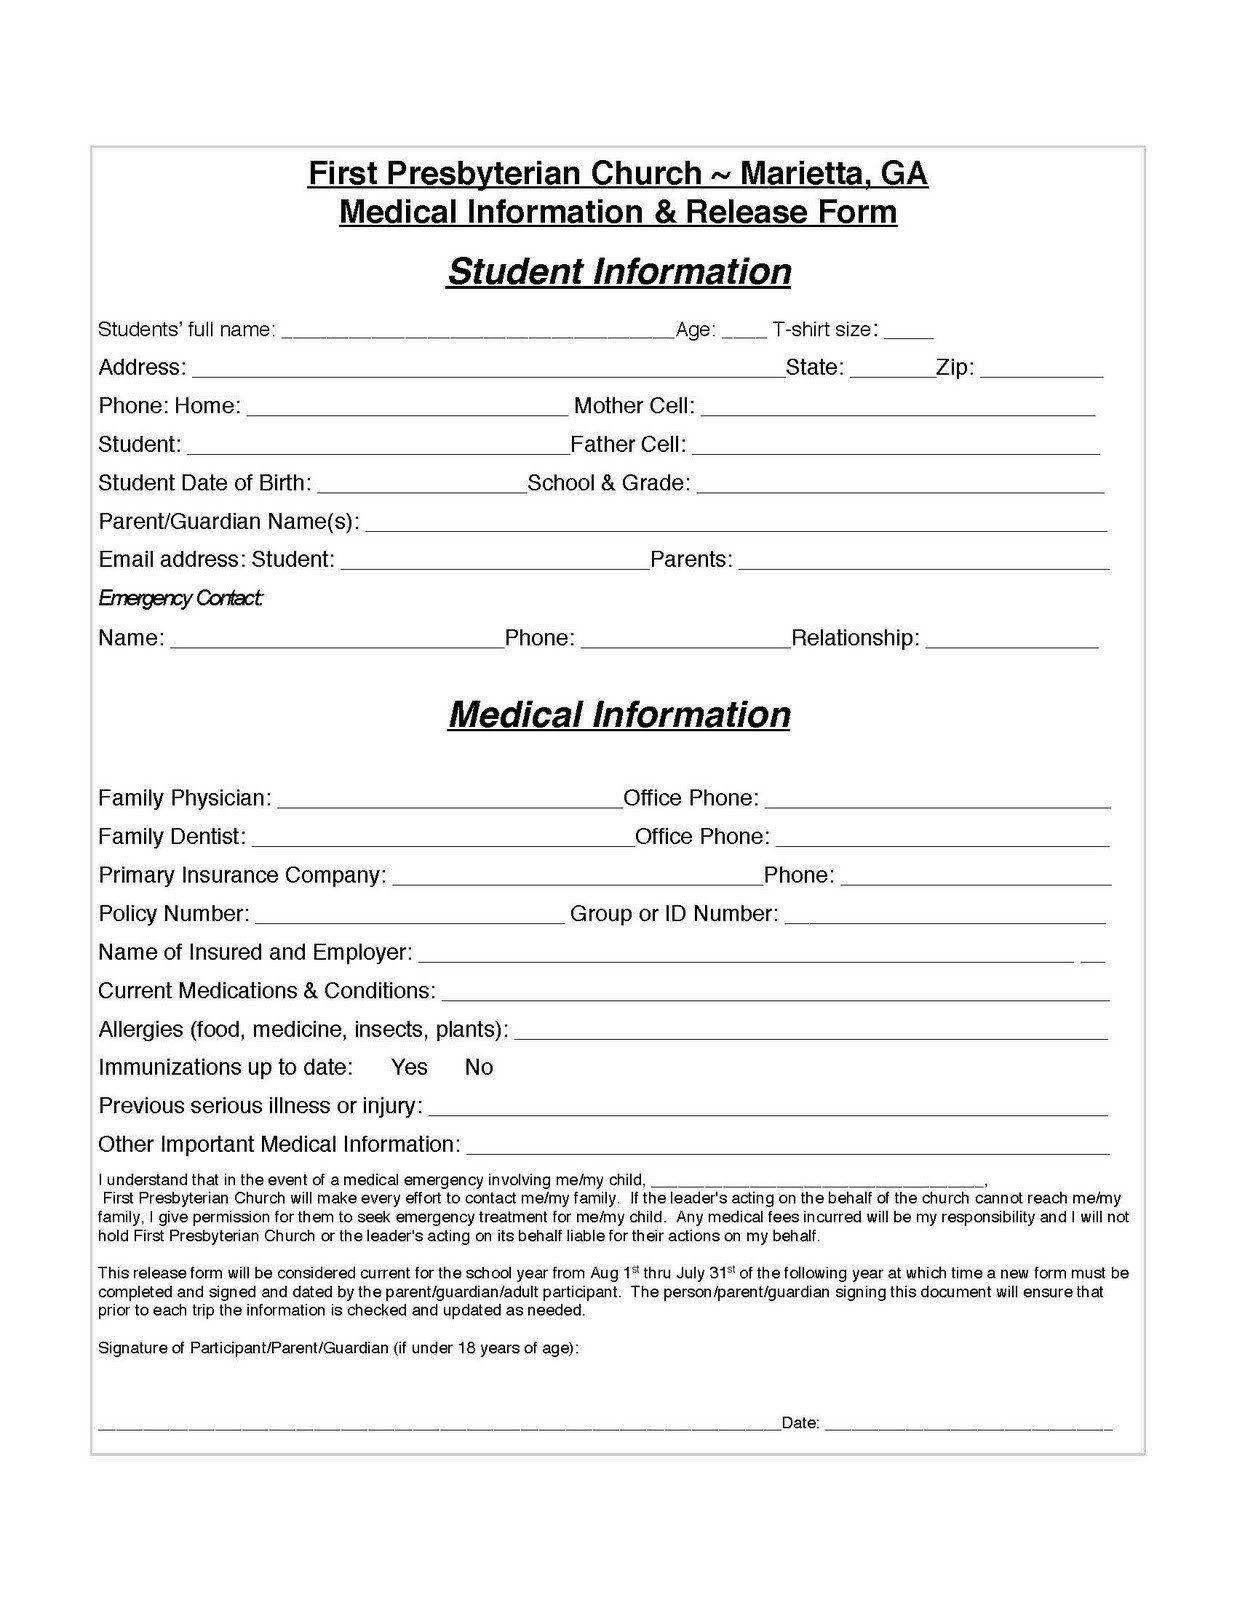 28 Medical Information form Template in 2020 Medical